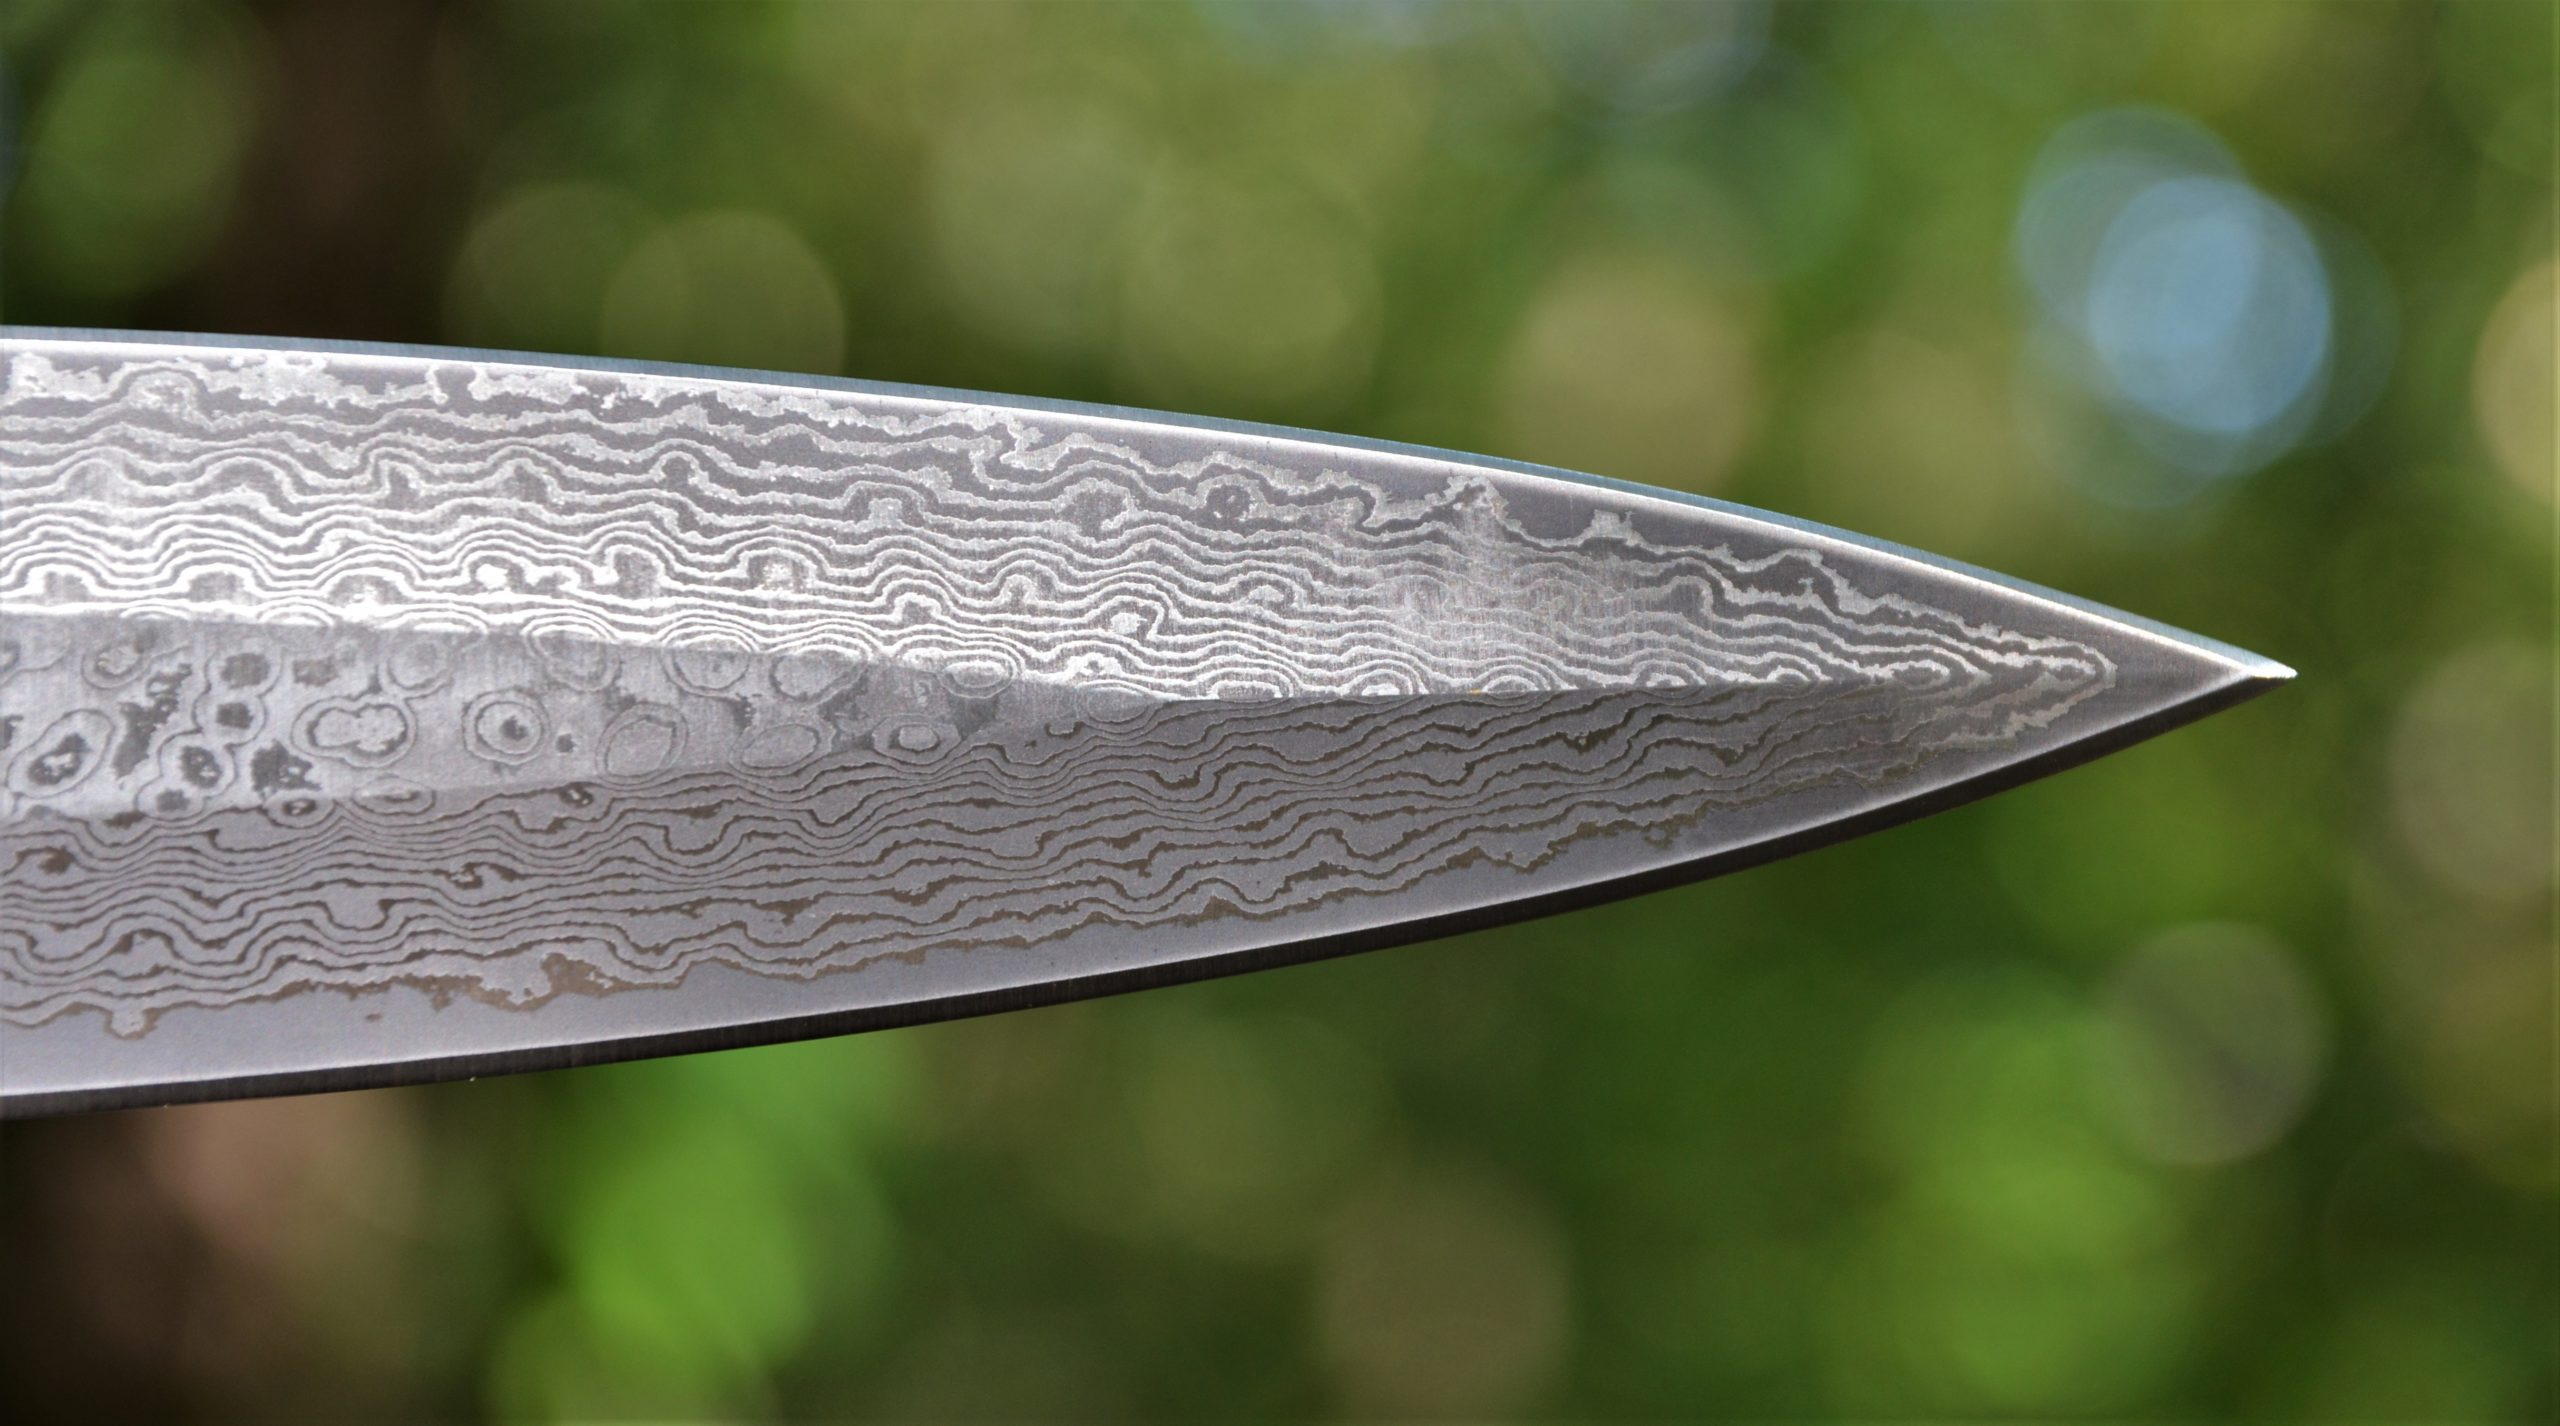 Parforce Damastmesser ROMANUS FT- Sautöter